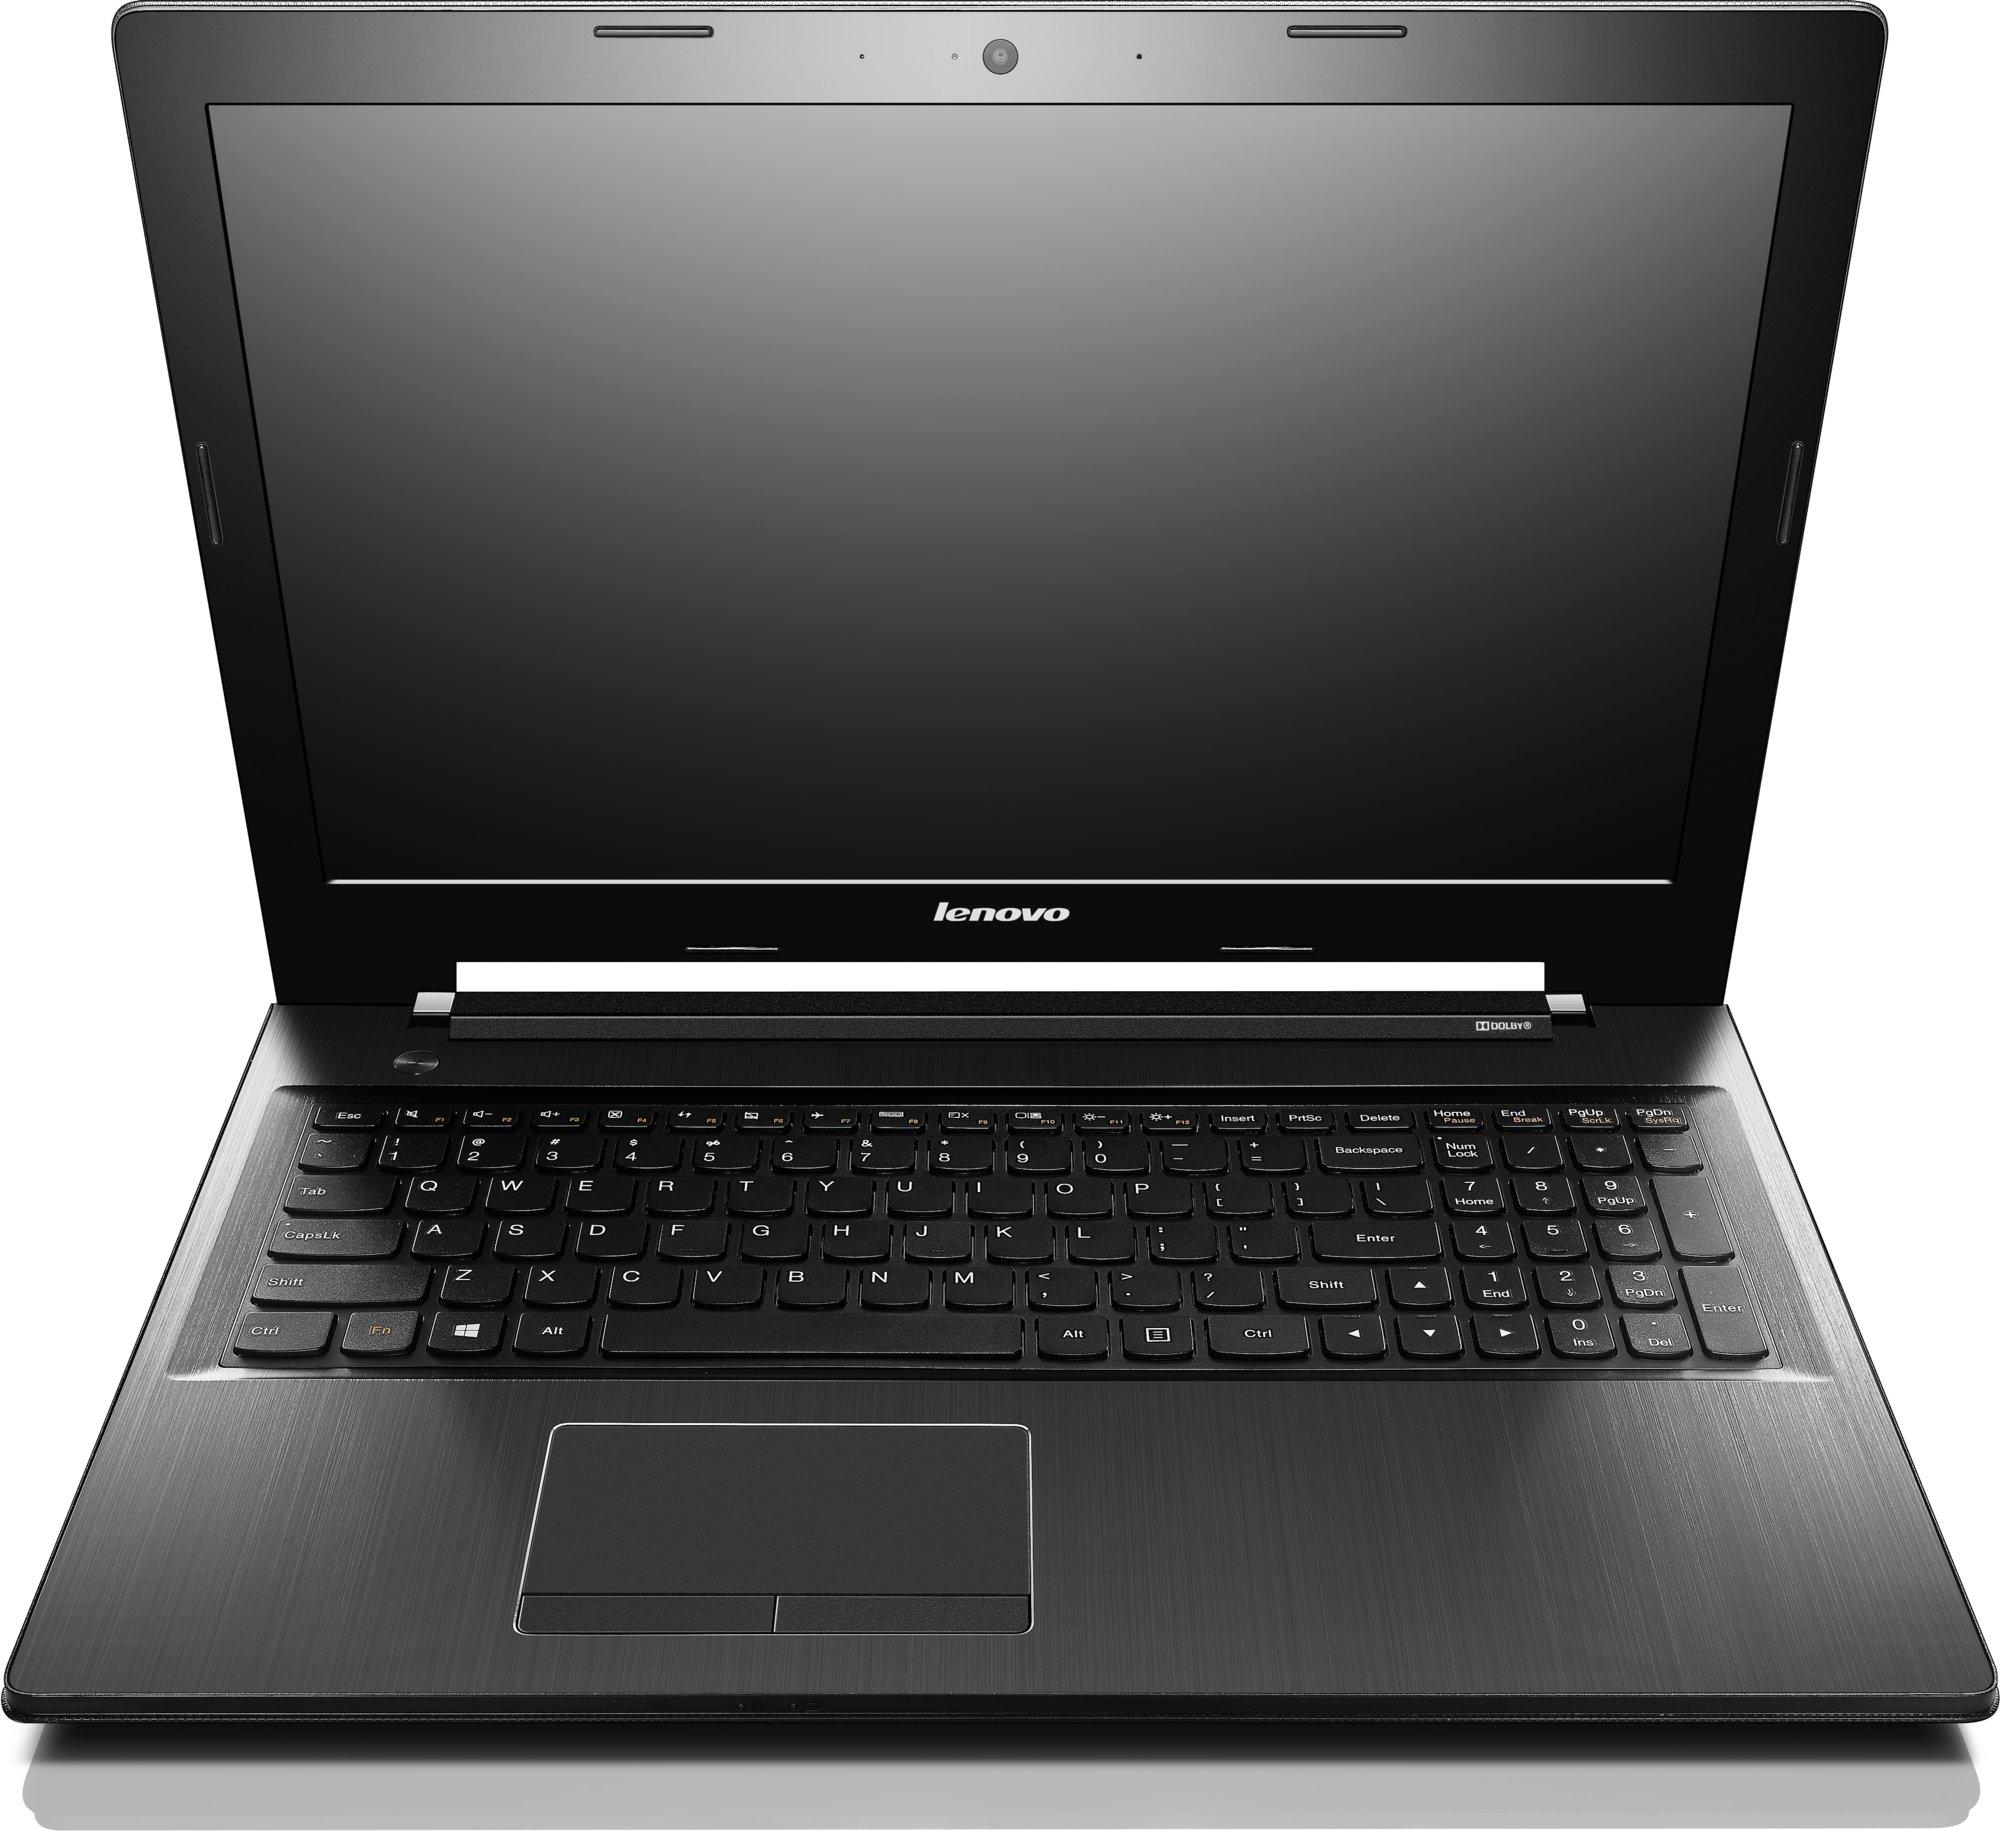 Recenze notebooku Lenovo IdeaPad Z50-75 a84f8d82a8